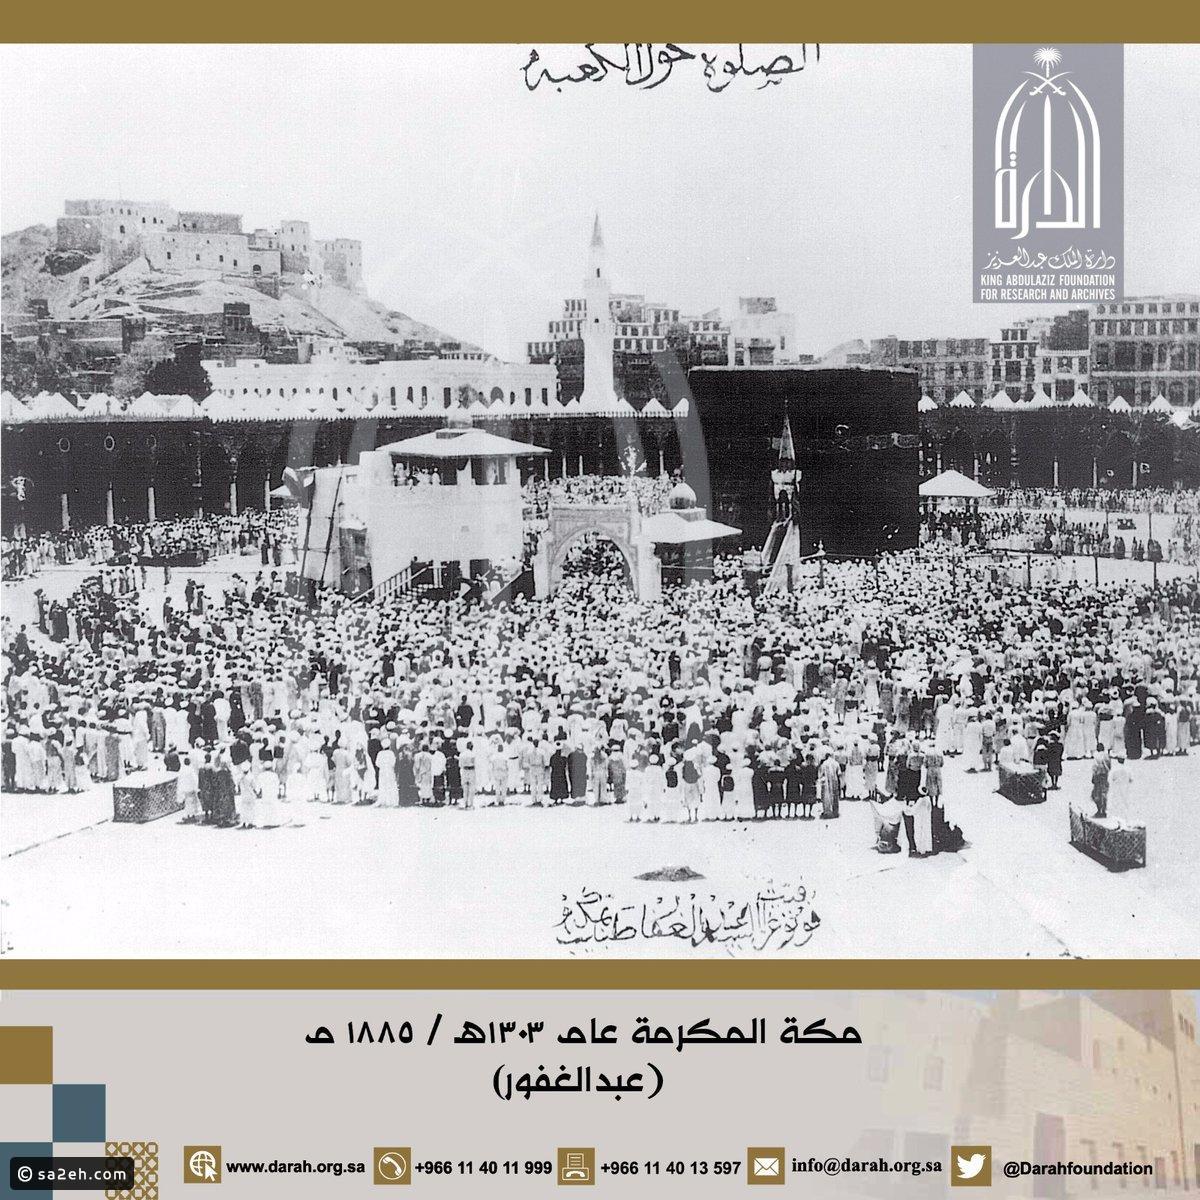 awww.alqiyady.com_site_images_sites_default_files_alqiyady_pro01d0fc138264a7a9f07c2fc4e0d79cb0.